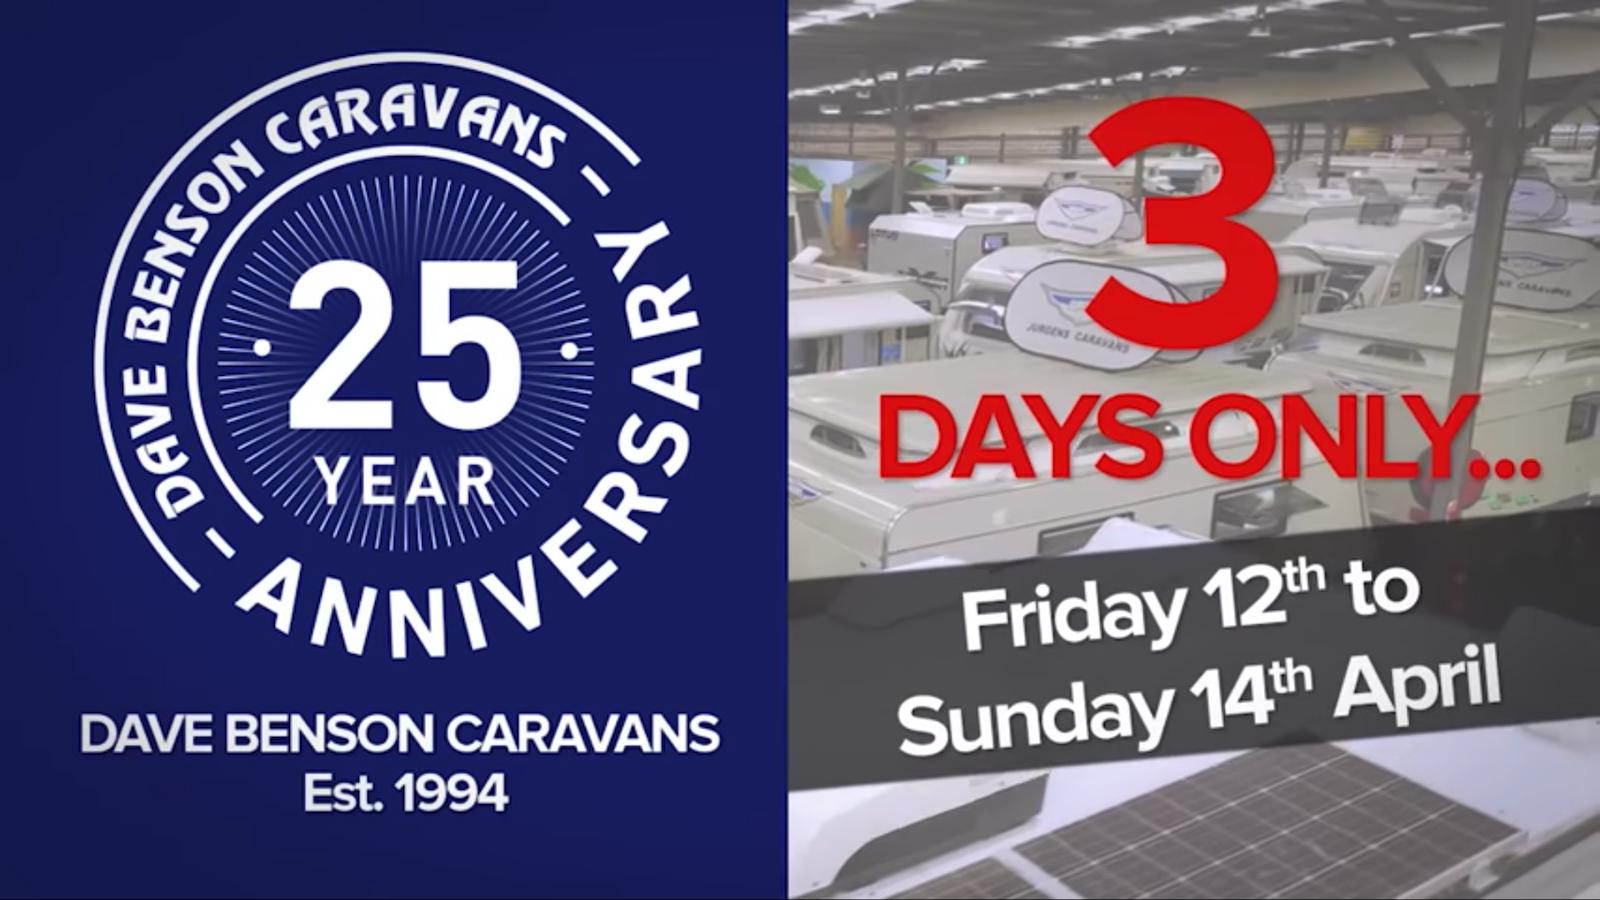 Dave Benson Caravans 25th Anniversary Sale